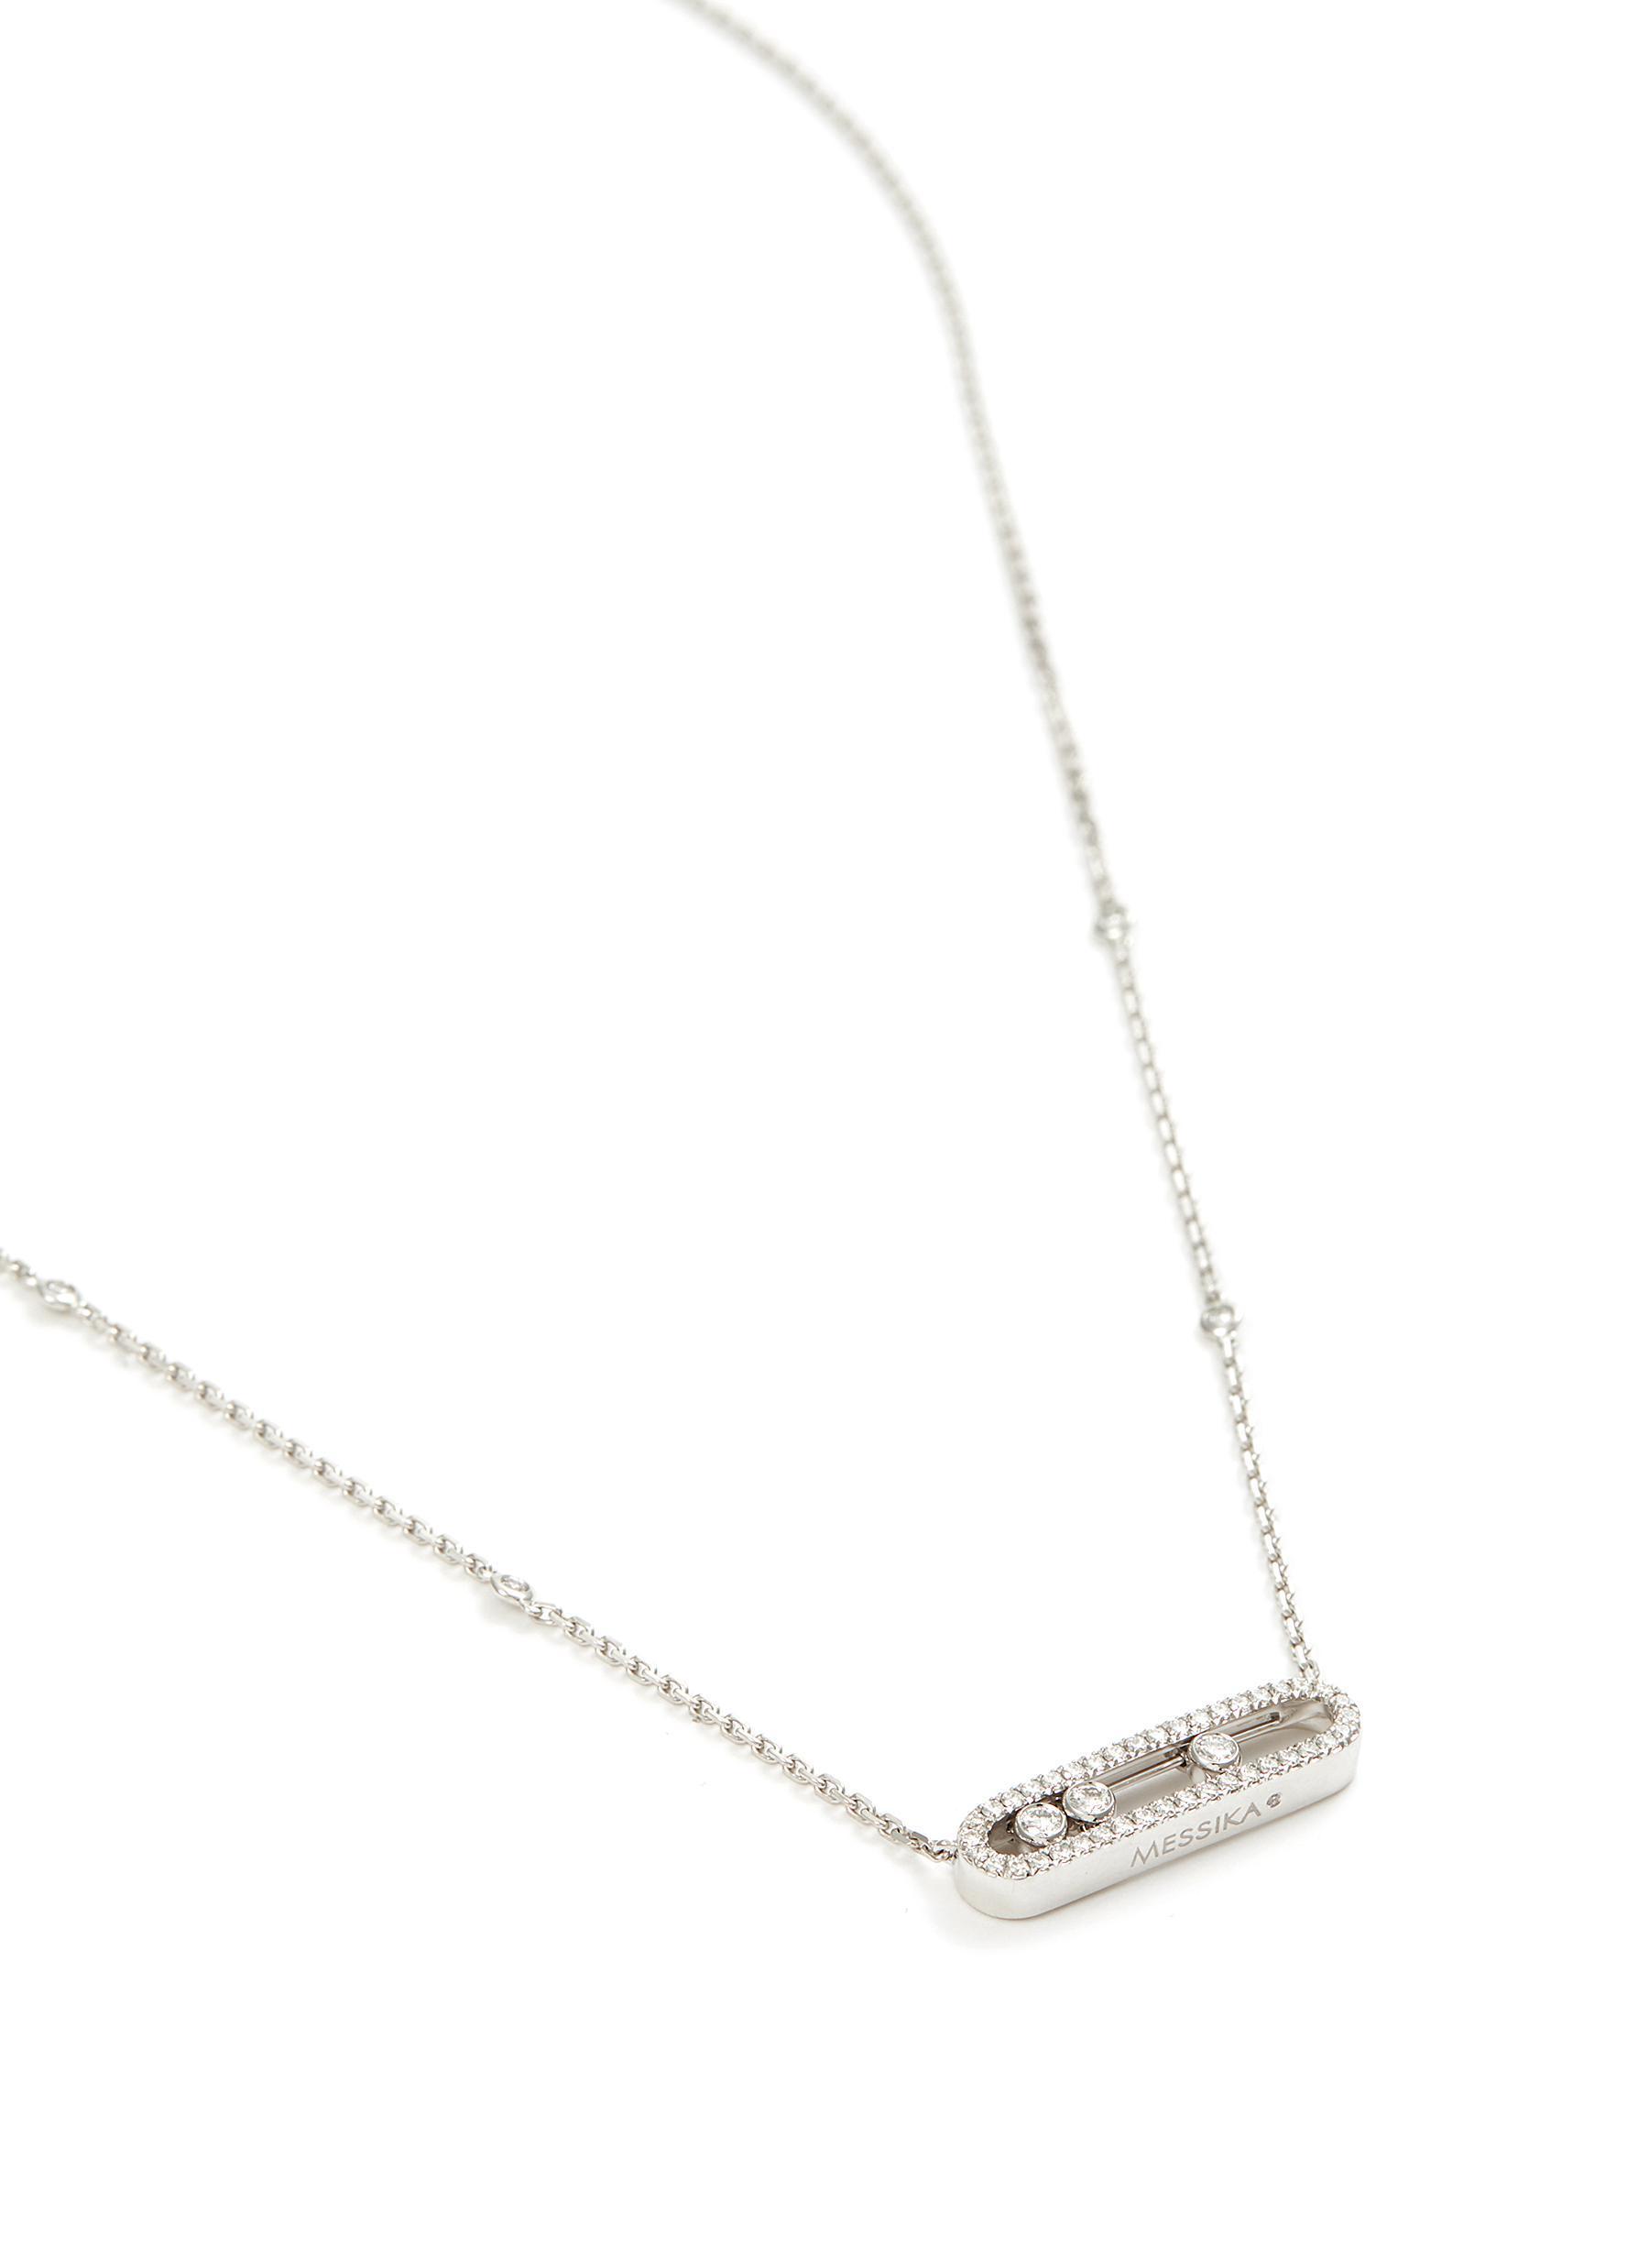 Messika 'baby Move Pavé' Diamond 18k White Gold Necklace in Metallic